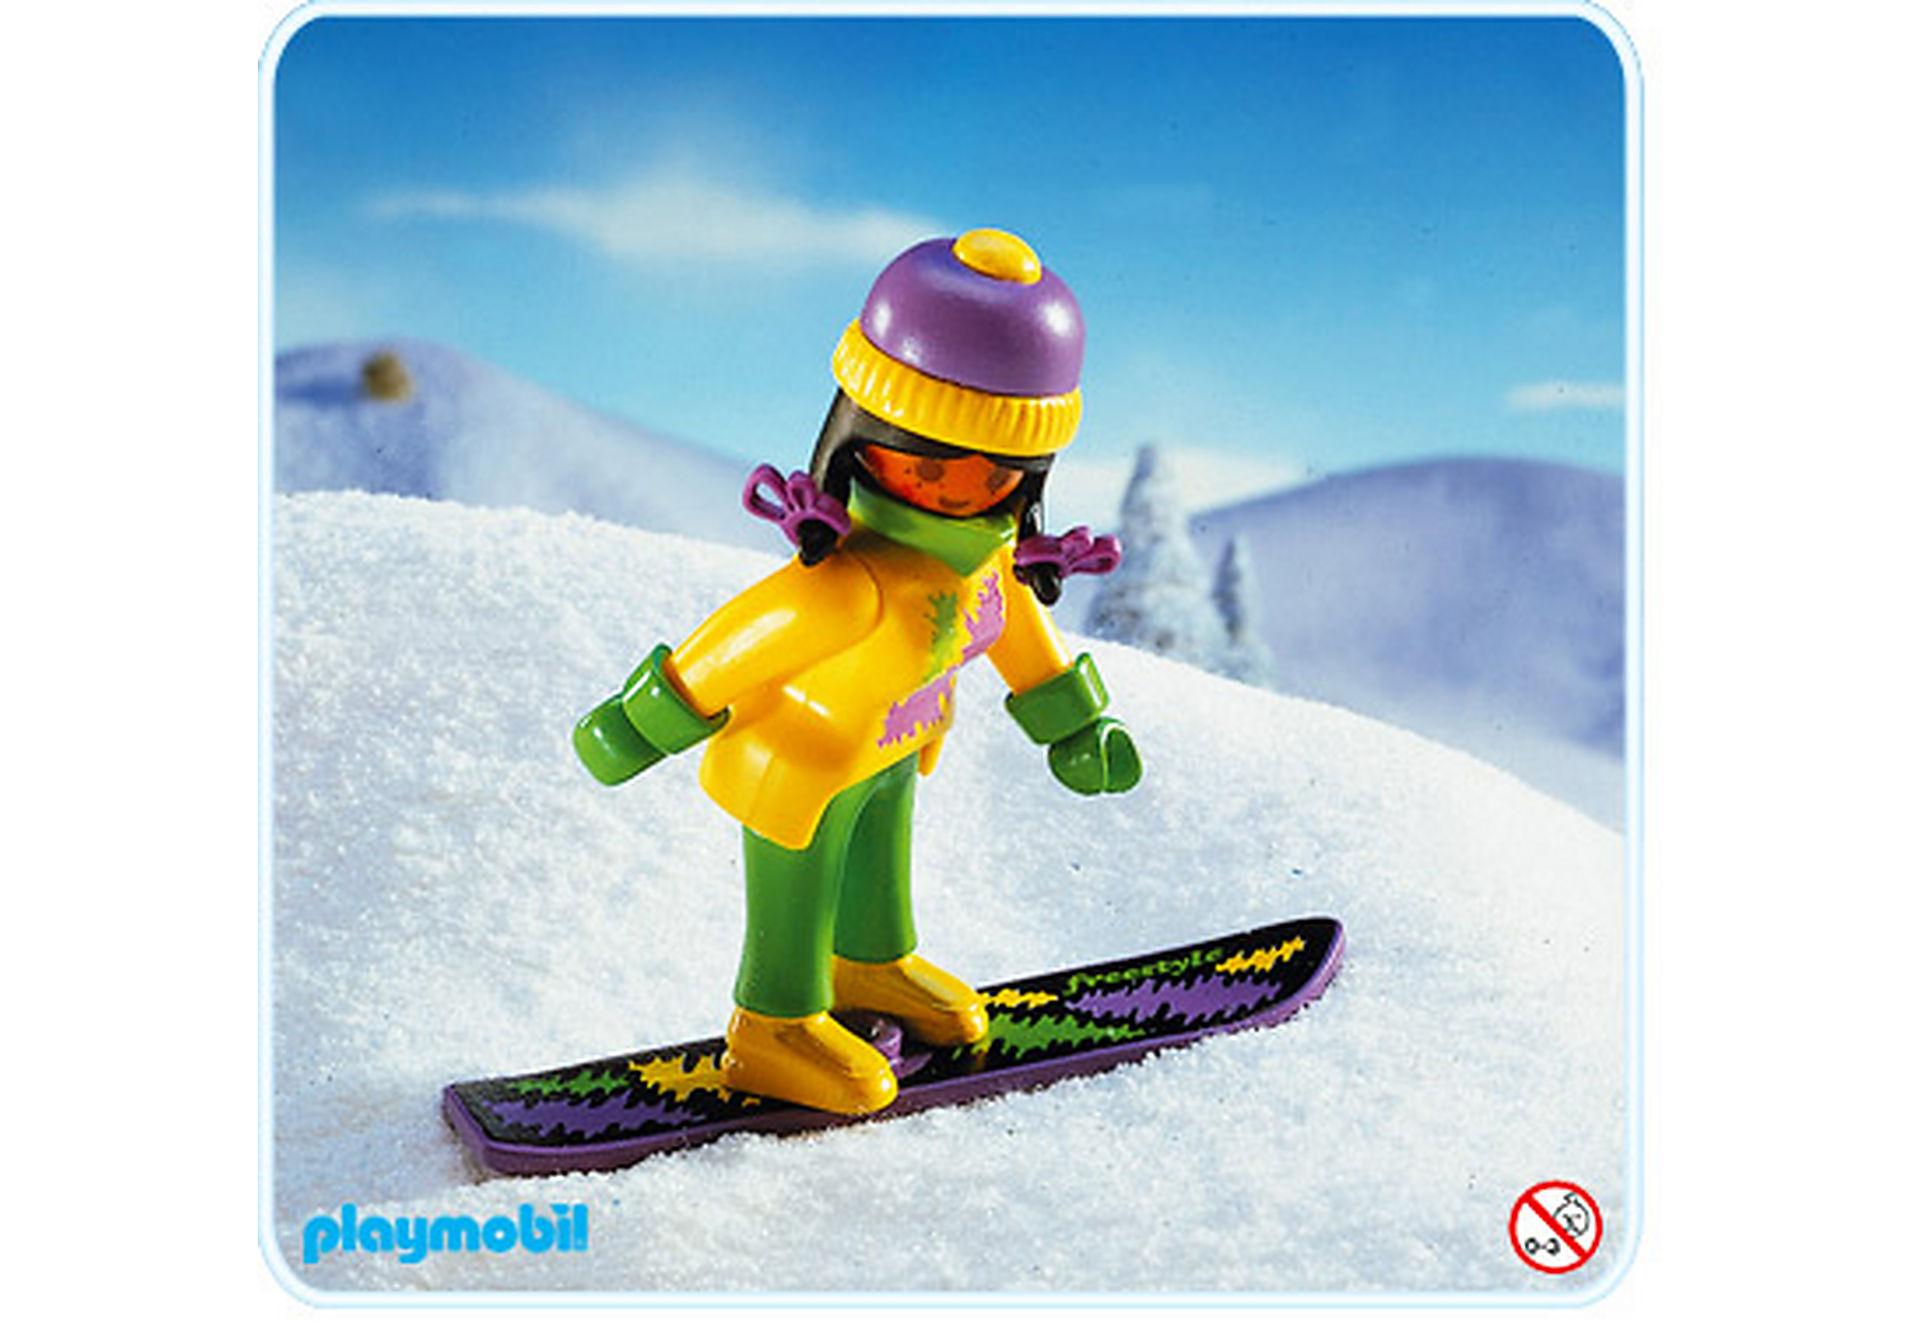 3683-A Snowboard-Fahrerin zoom image1